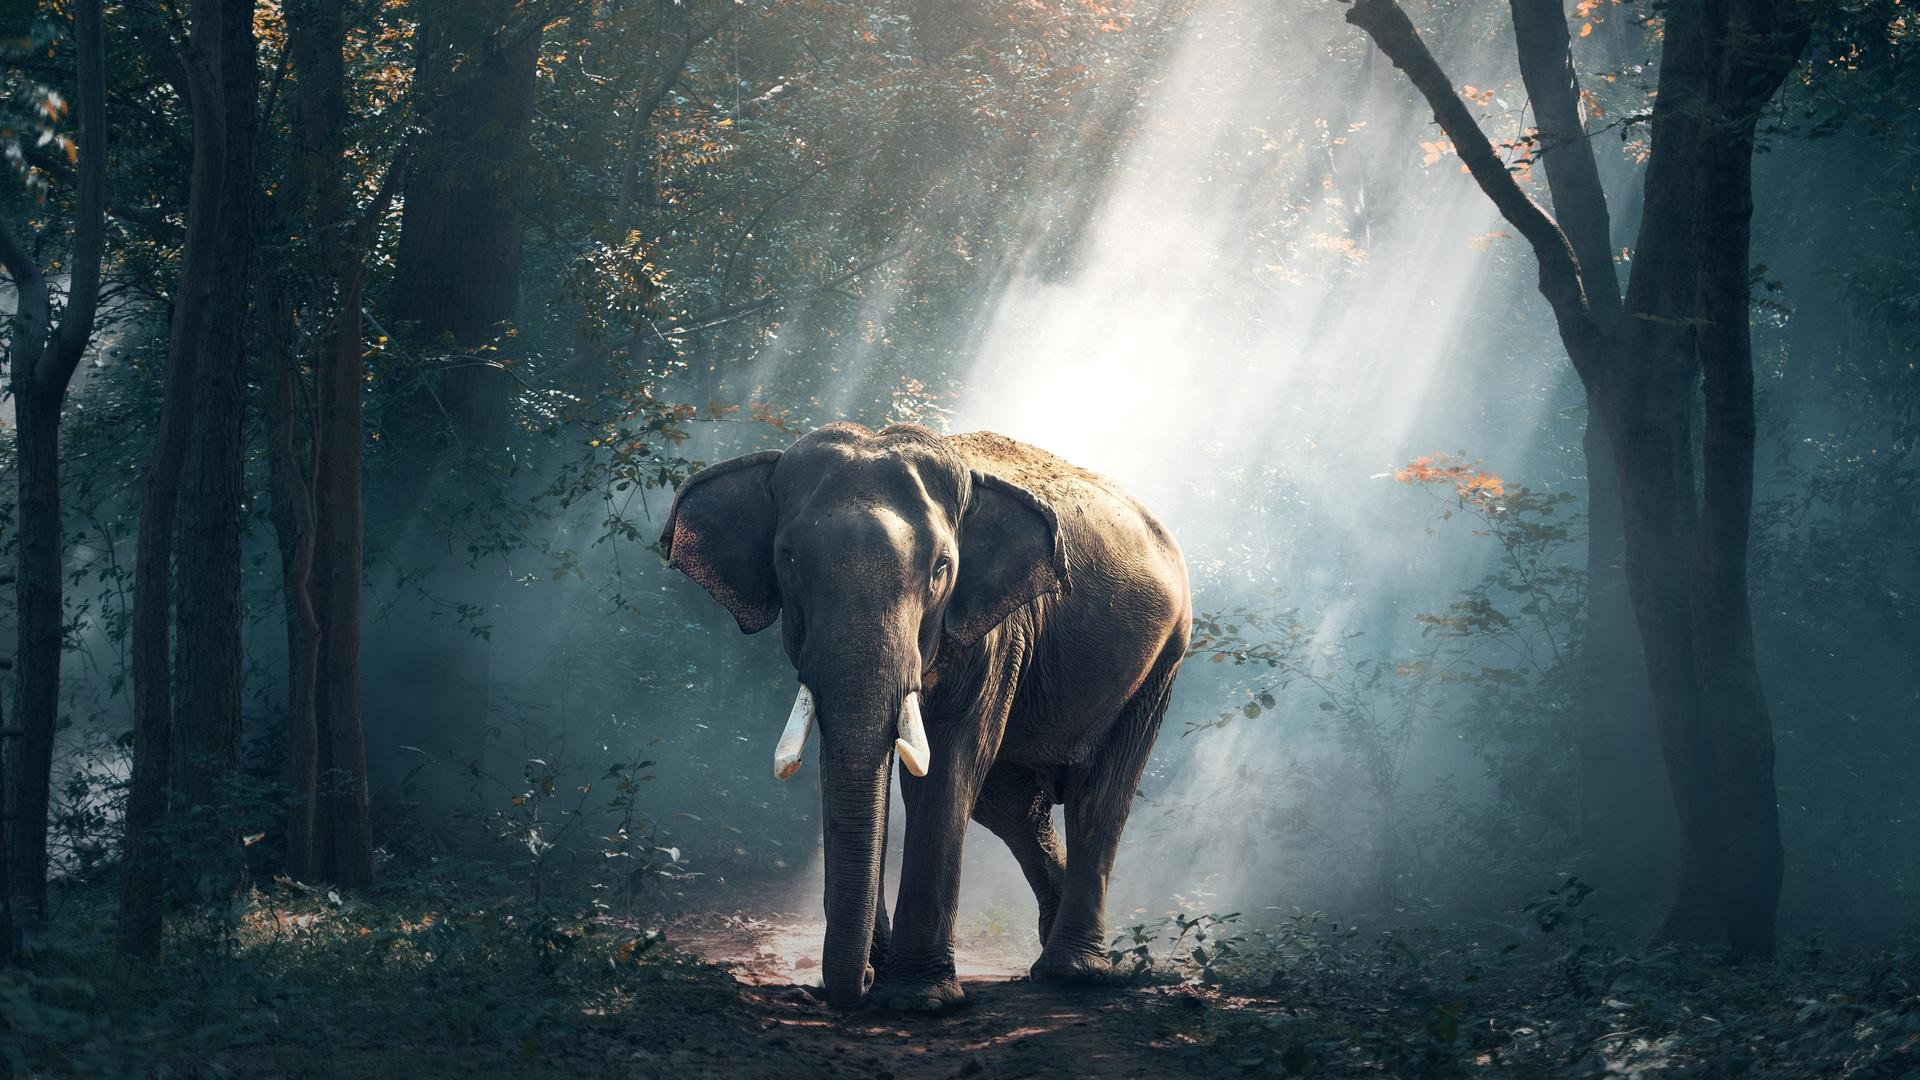 1920x1080 Elephant Laptop Full Hd 1080p Hd 4k Wallpapers